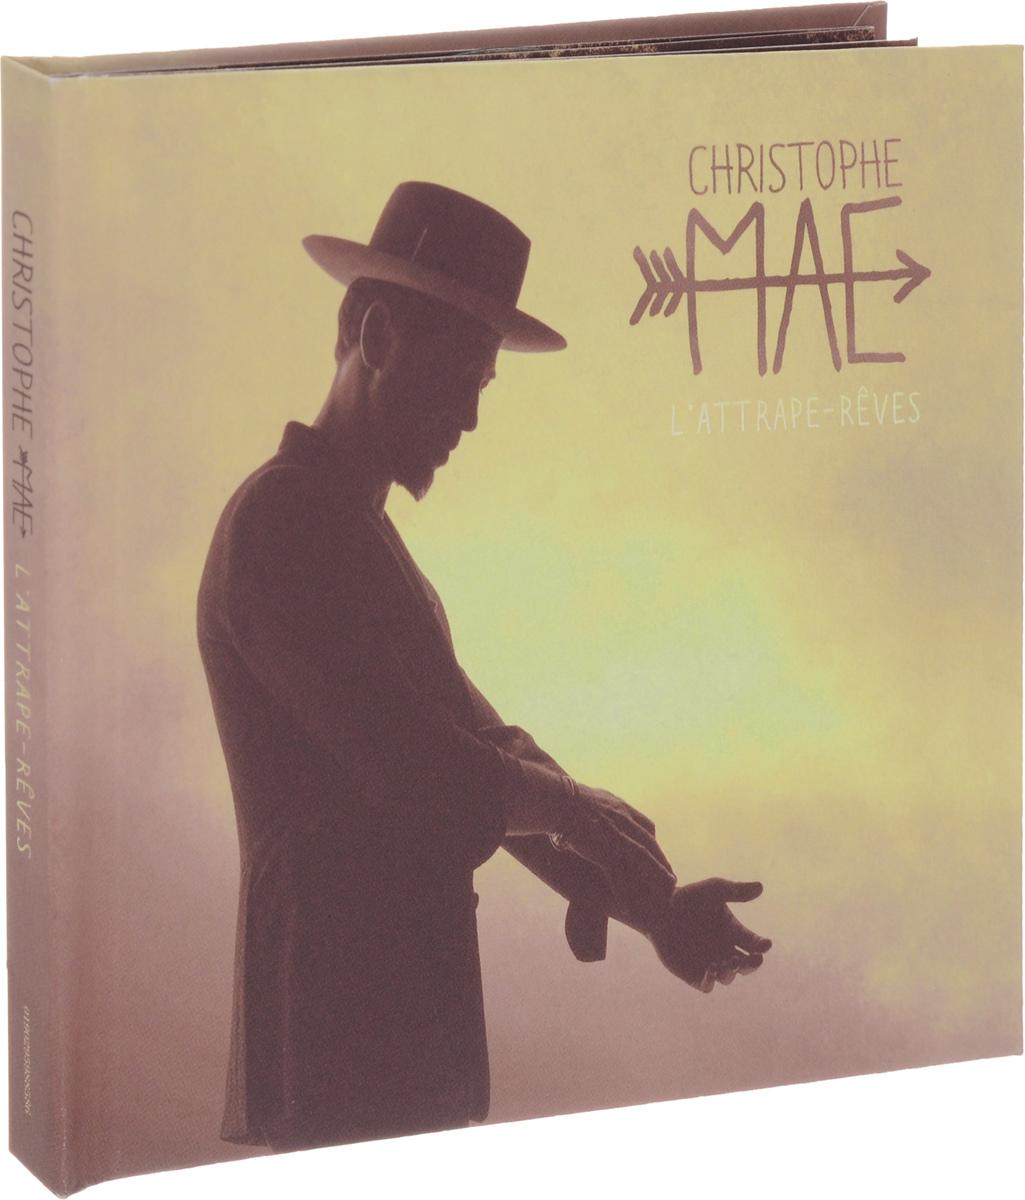 Christophe Mae. L'attrape-Reves (CD + DVD) 2016 2 CD + DVD